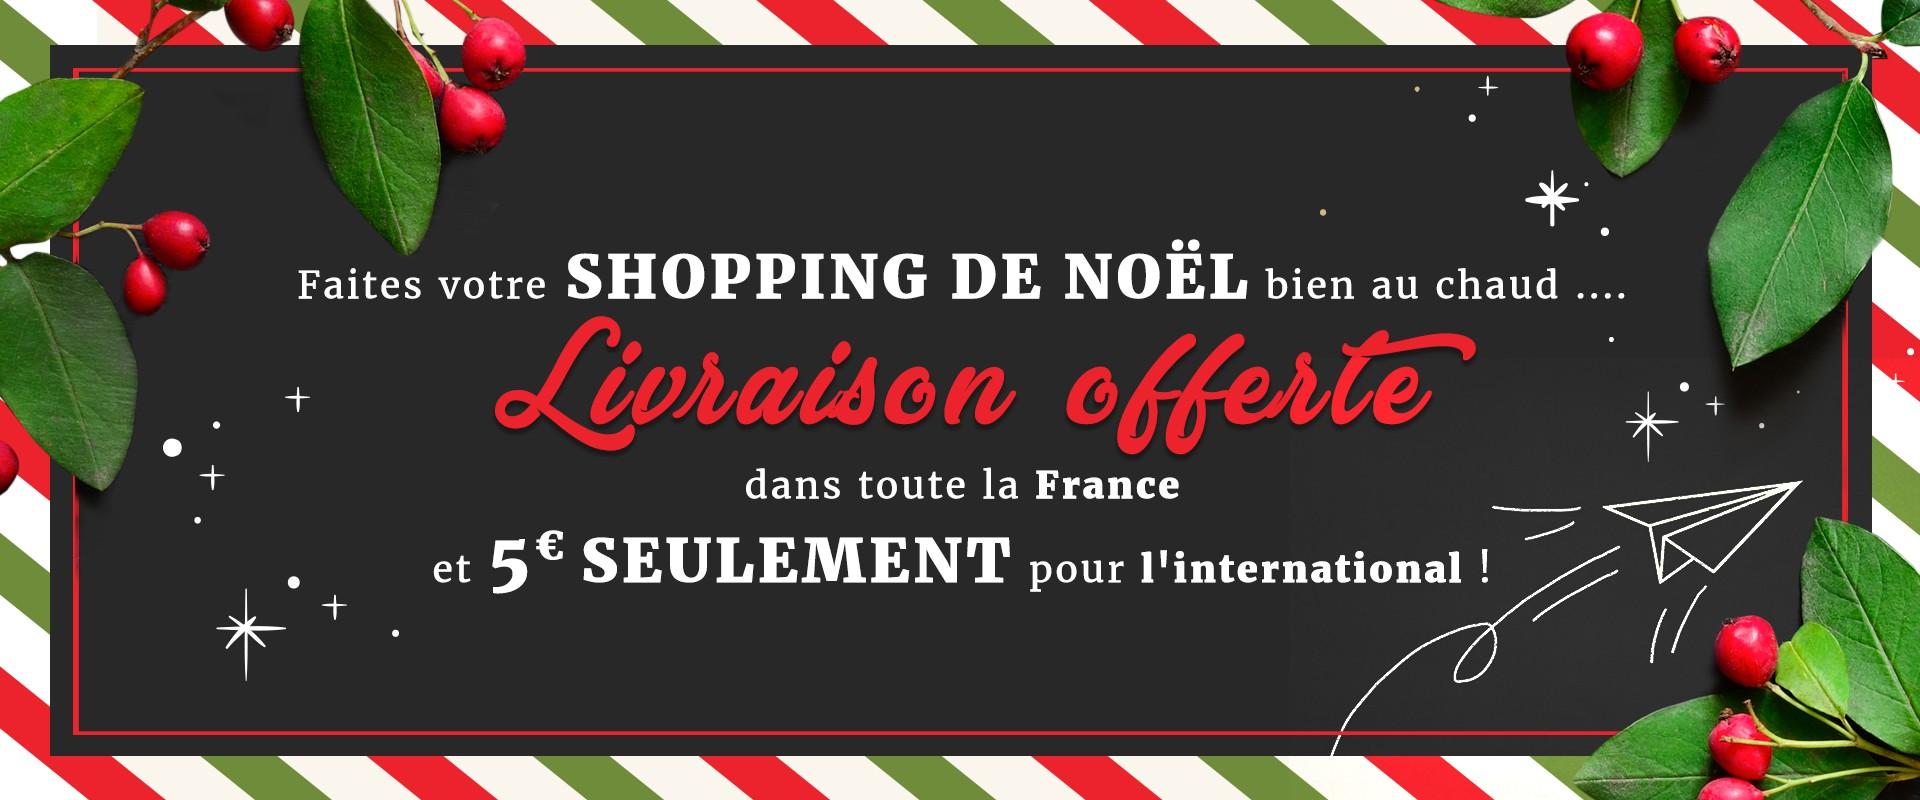 Shopping de Noël 2017